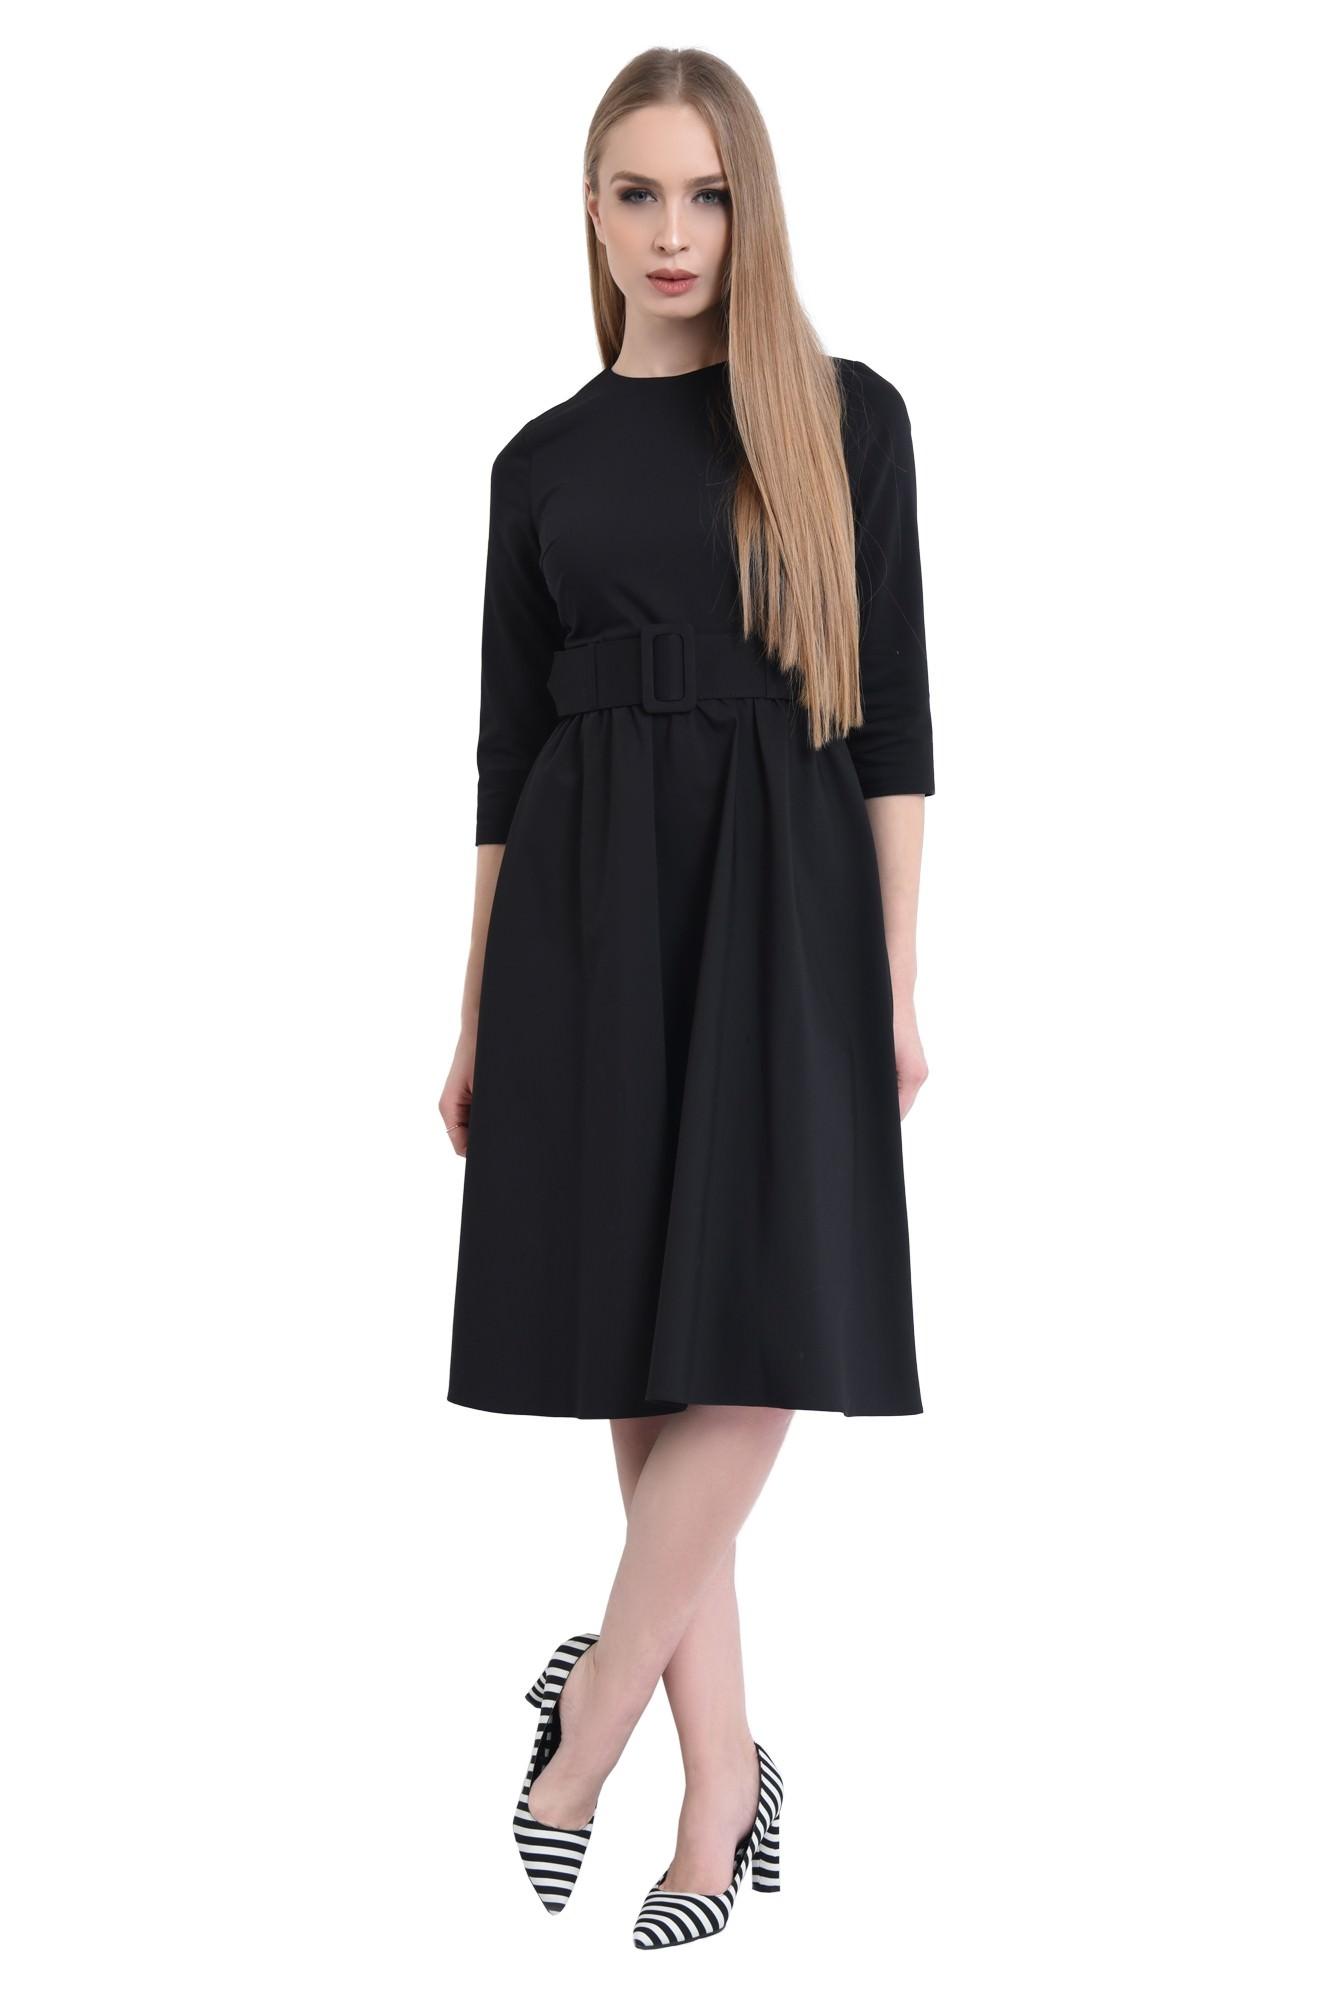 3 - 360 - Rochie casual, centura material textil